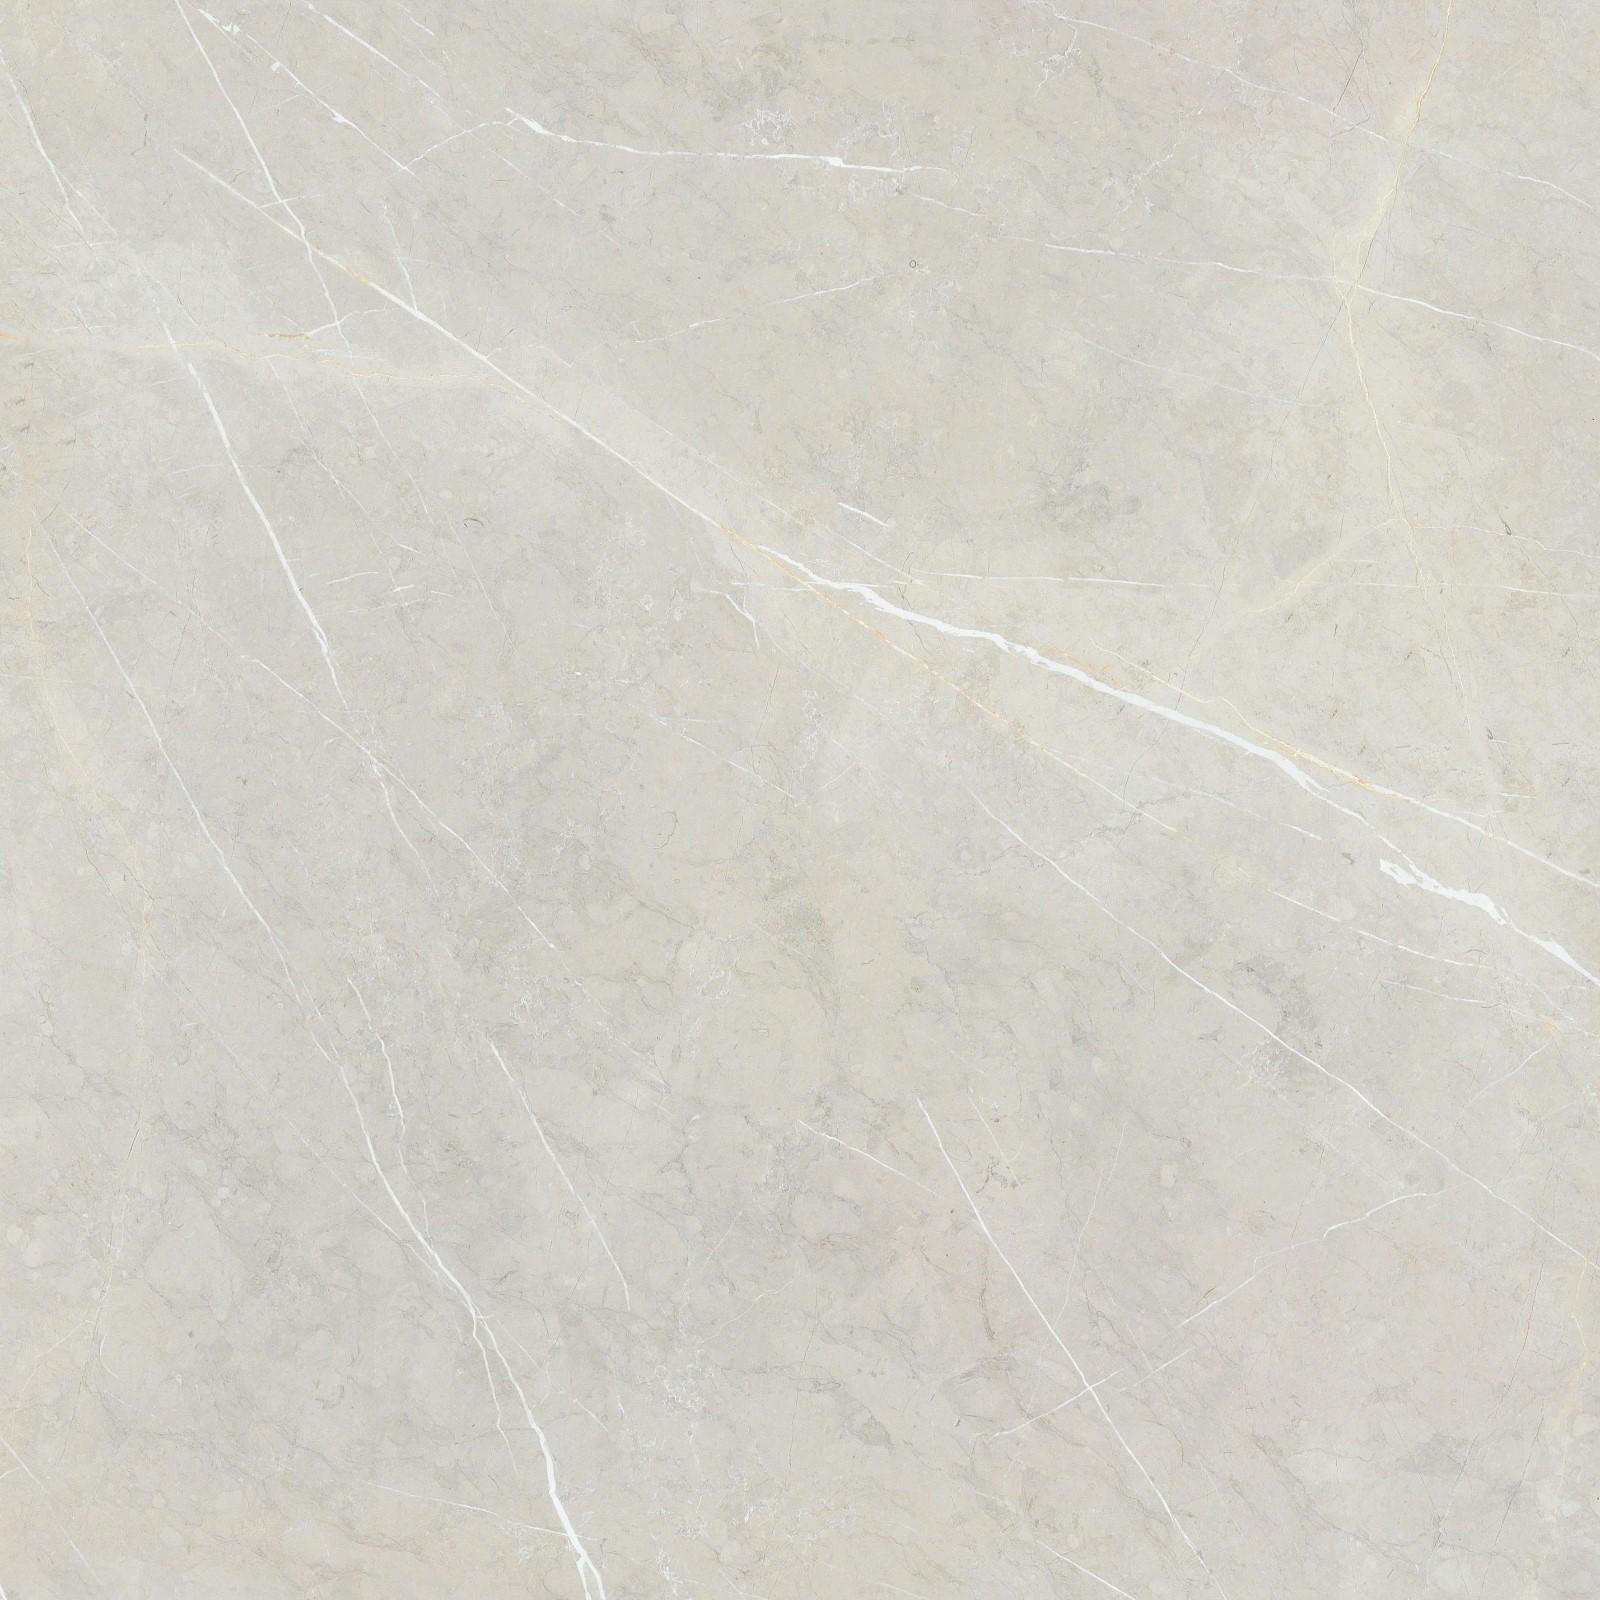 Overland ceramics decorative white marble floor tiles price for Villa-1